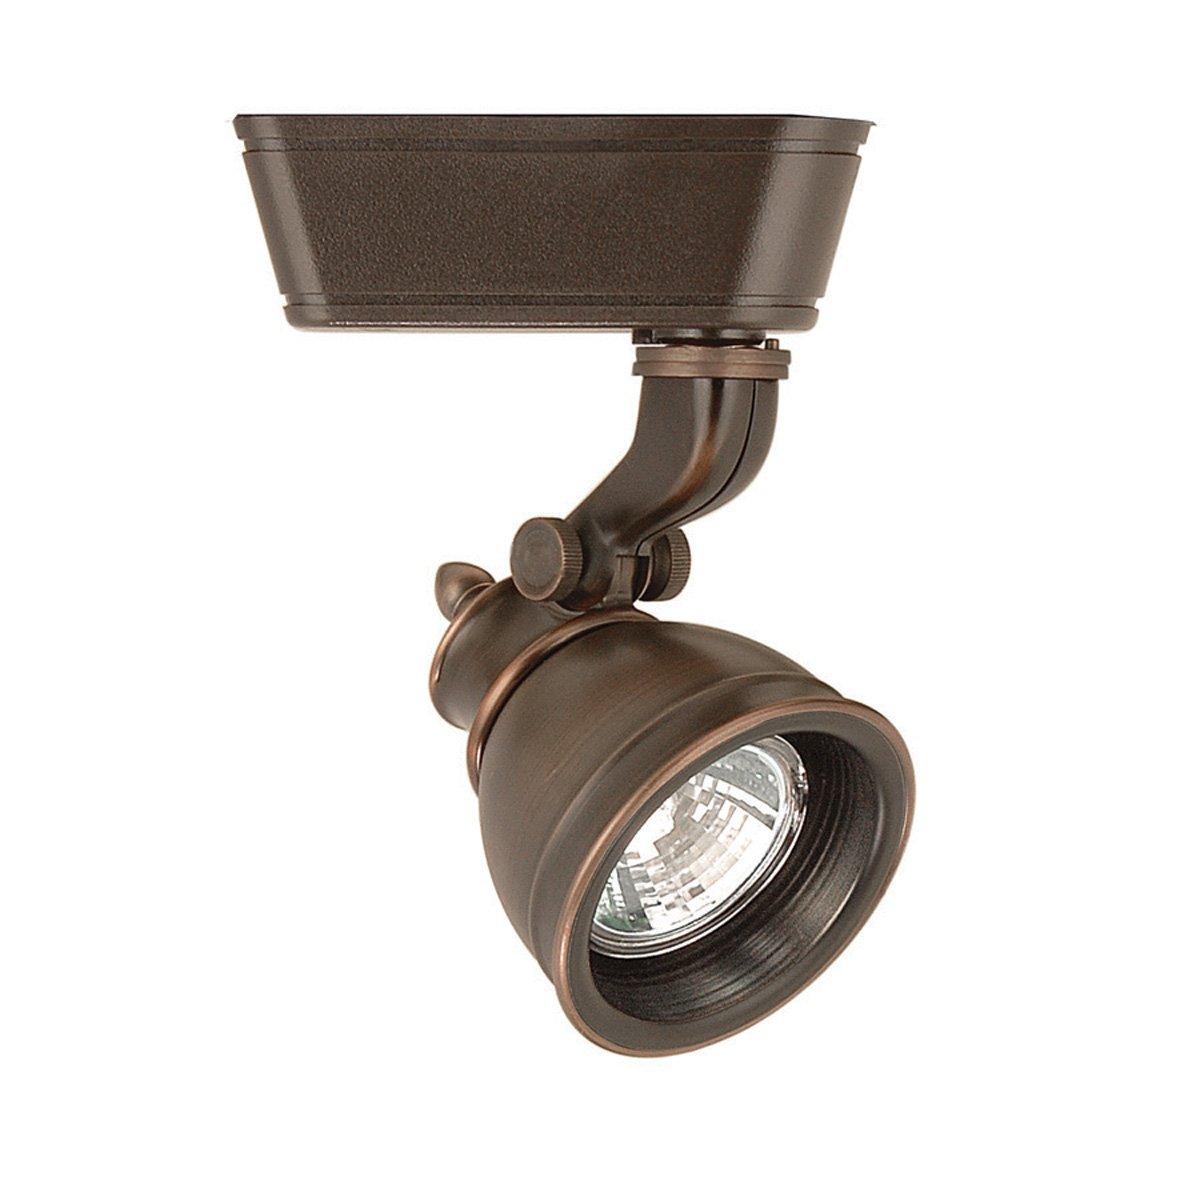 Wac Lighting LHT-874-AB HT-874 Low Voltage Head L Track Fixture Antique Bronze